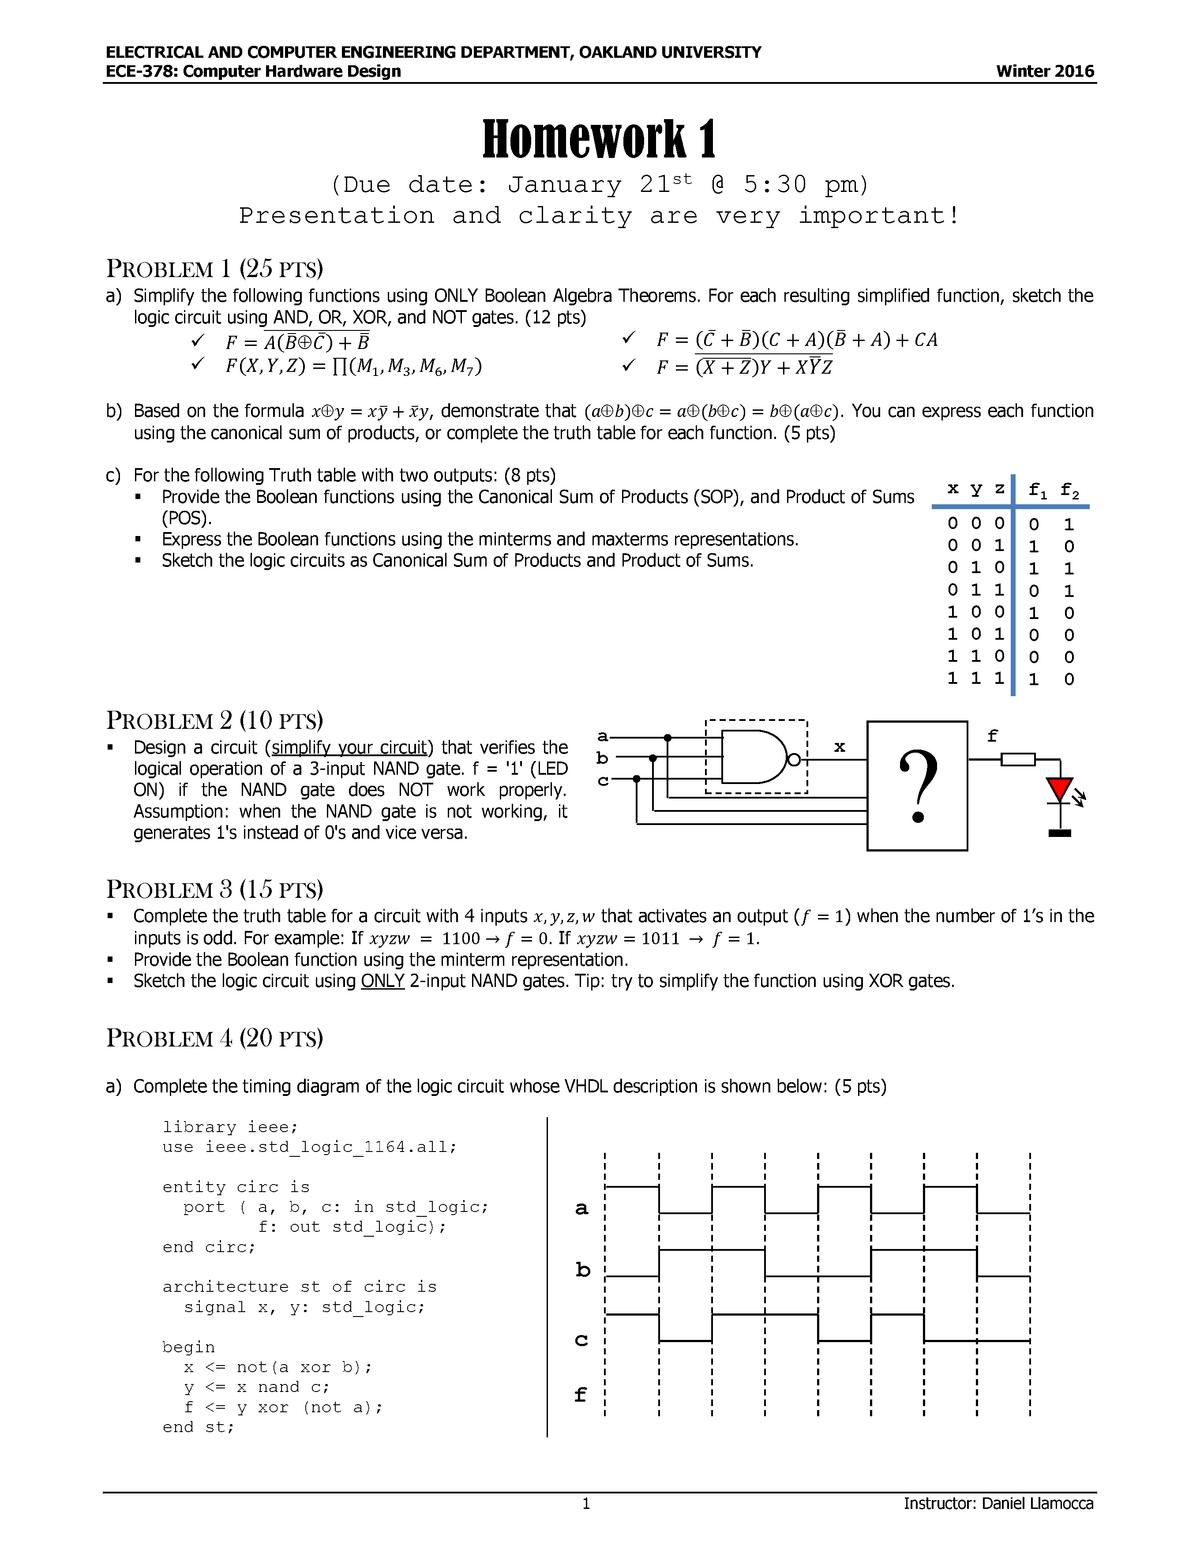 HW1, q + a - Homework assignment 1 - ECE 378: Computer